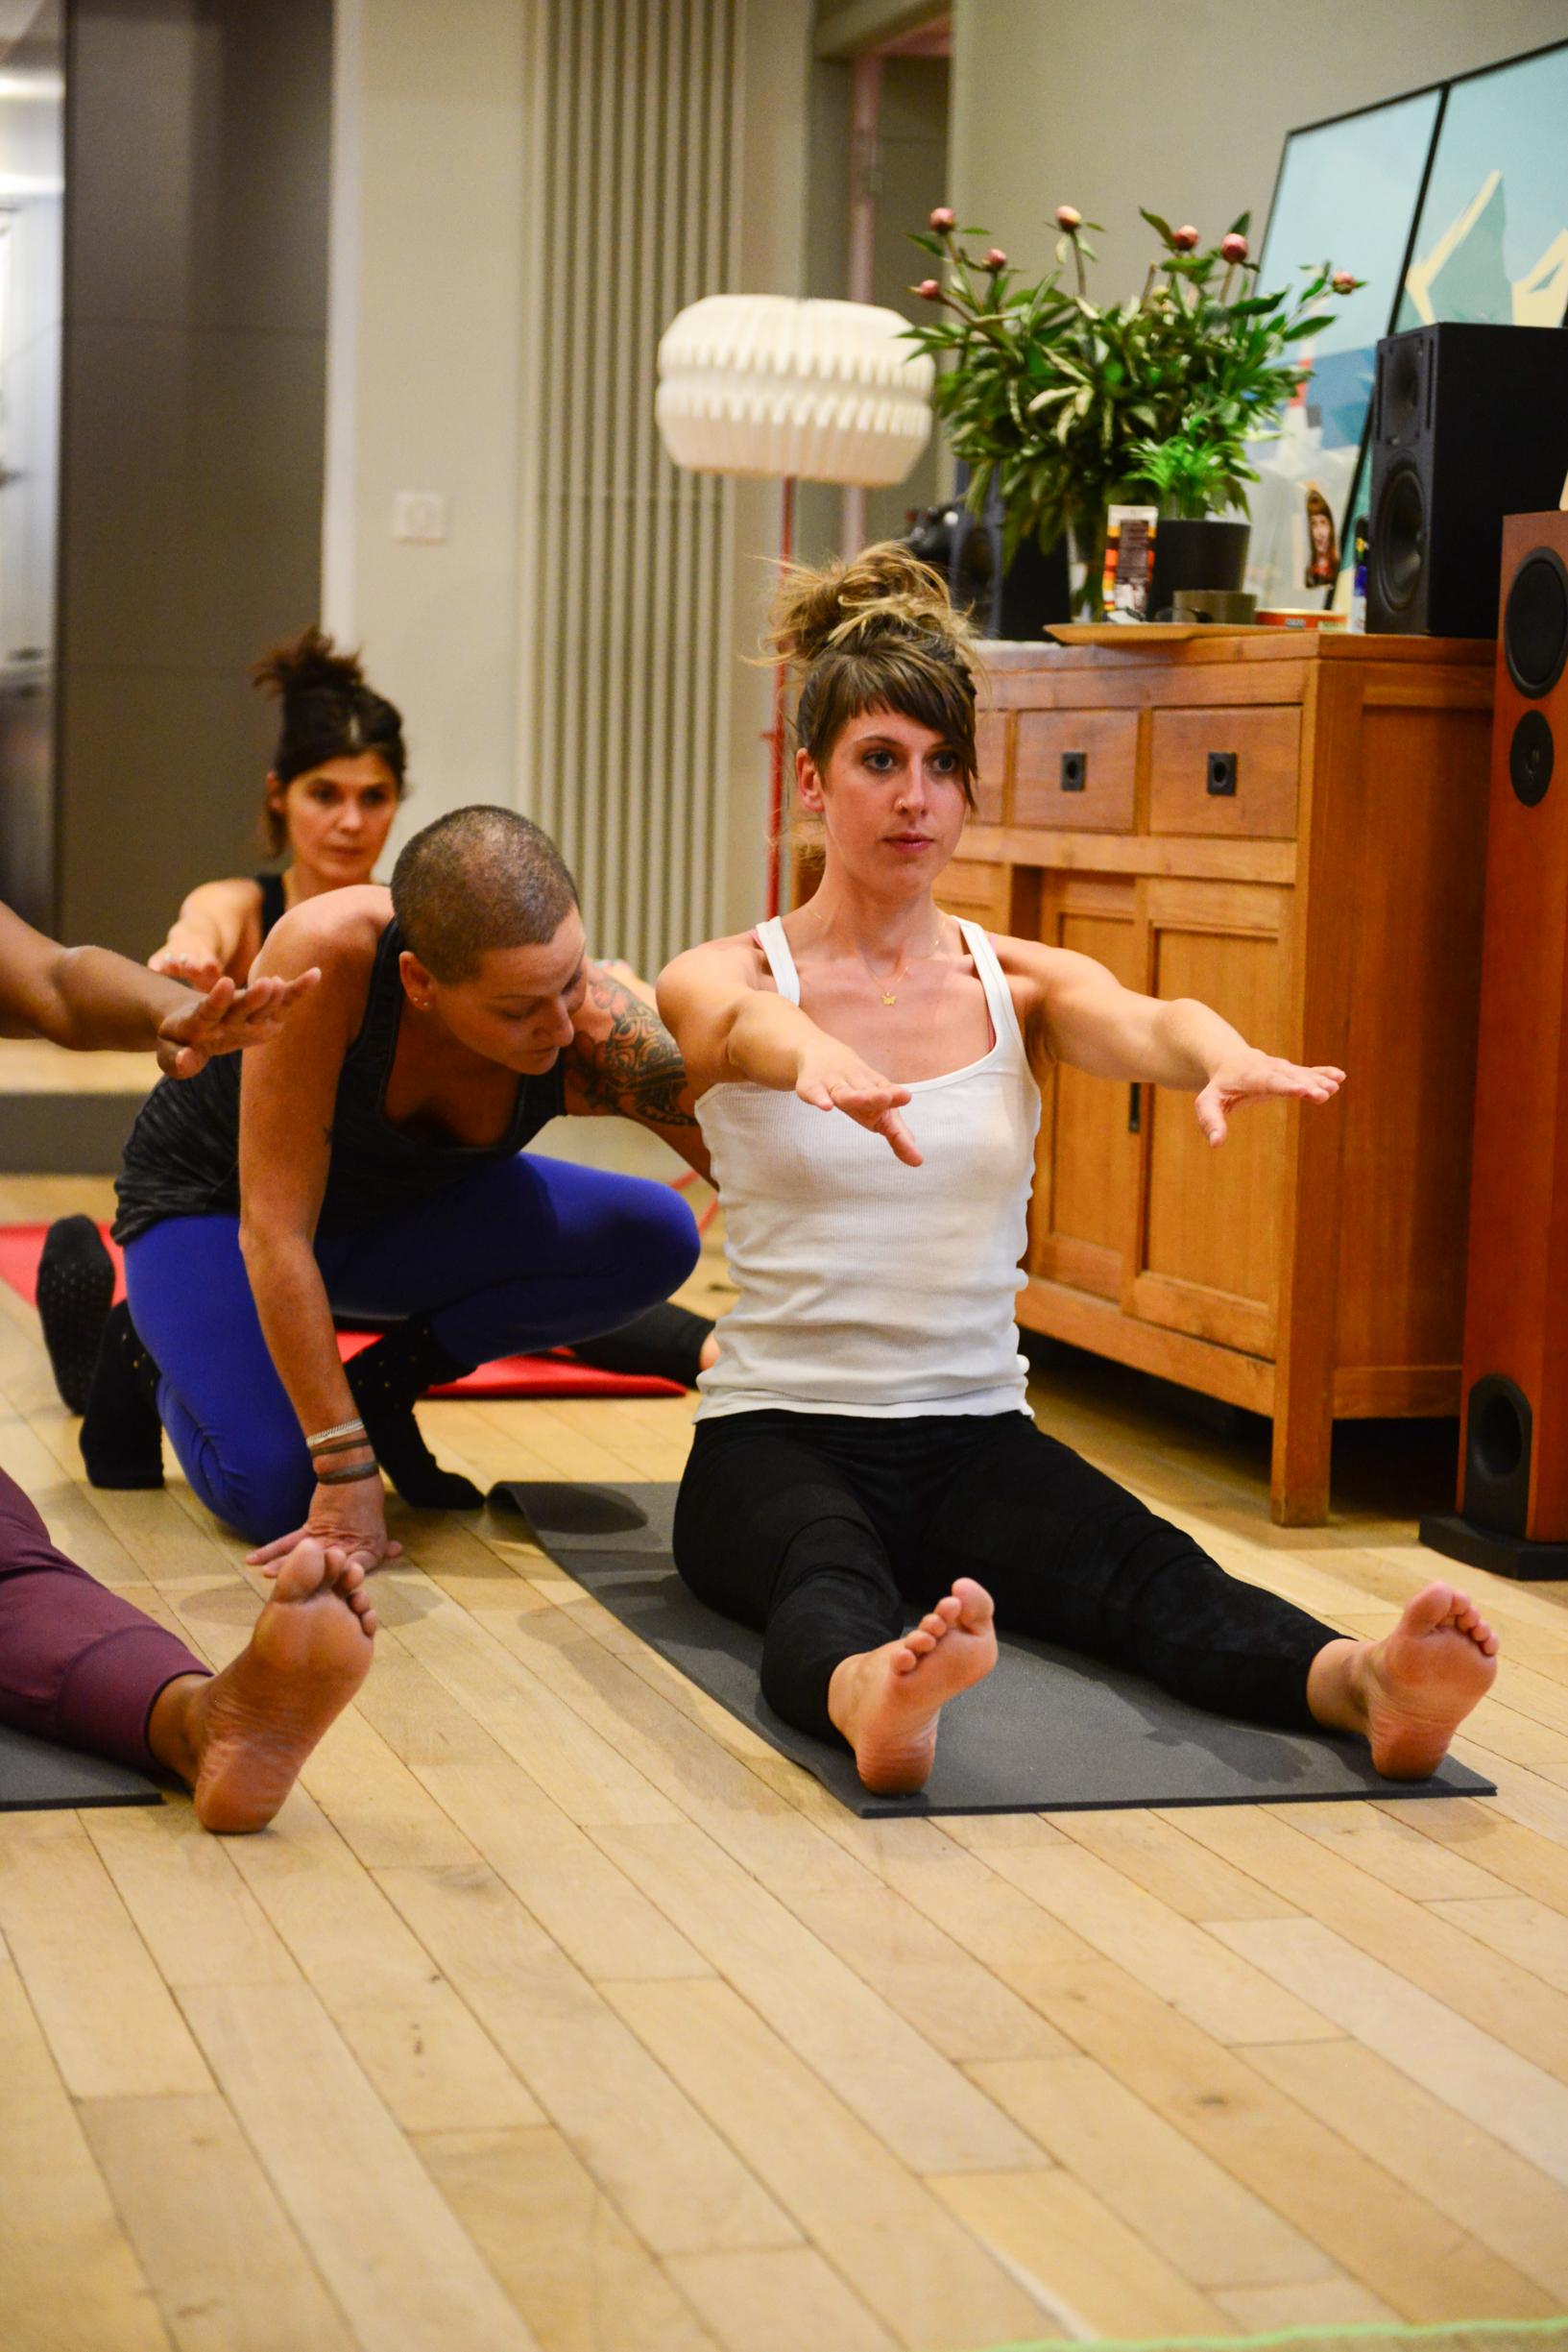 oly-be-yoga-cours-a-domicile-professeur.jpg